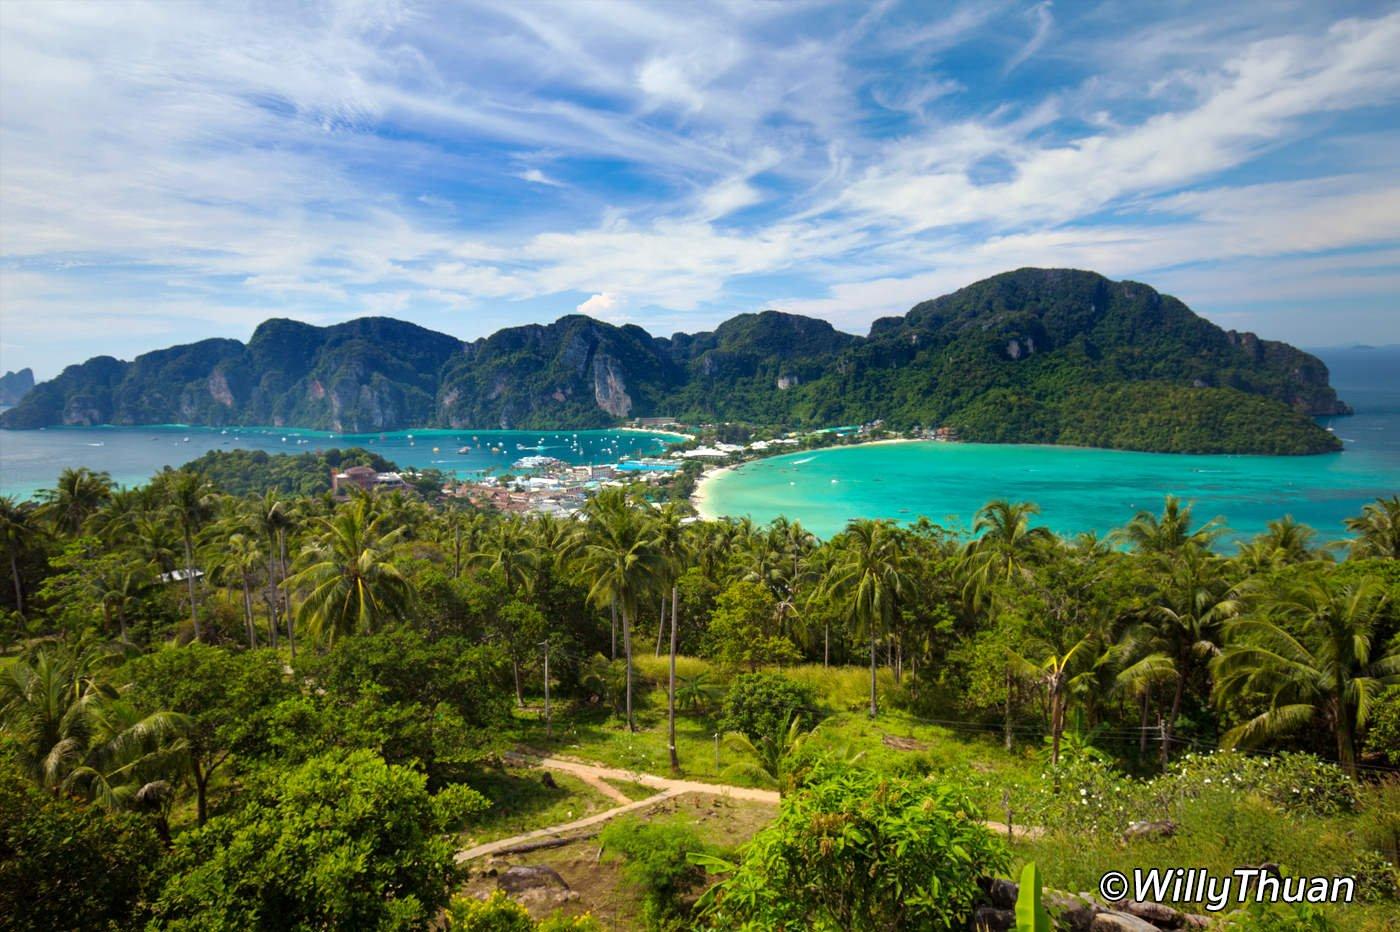 Phi Phi Islands What to Do on Phi Phi Island? - Phuket 101